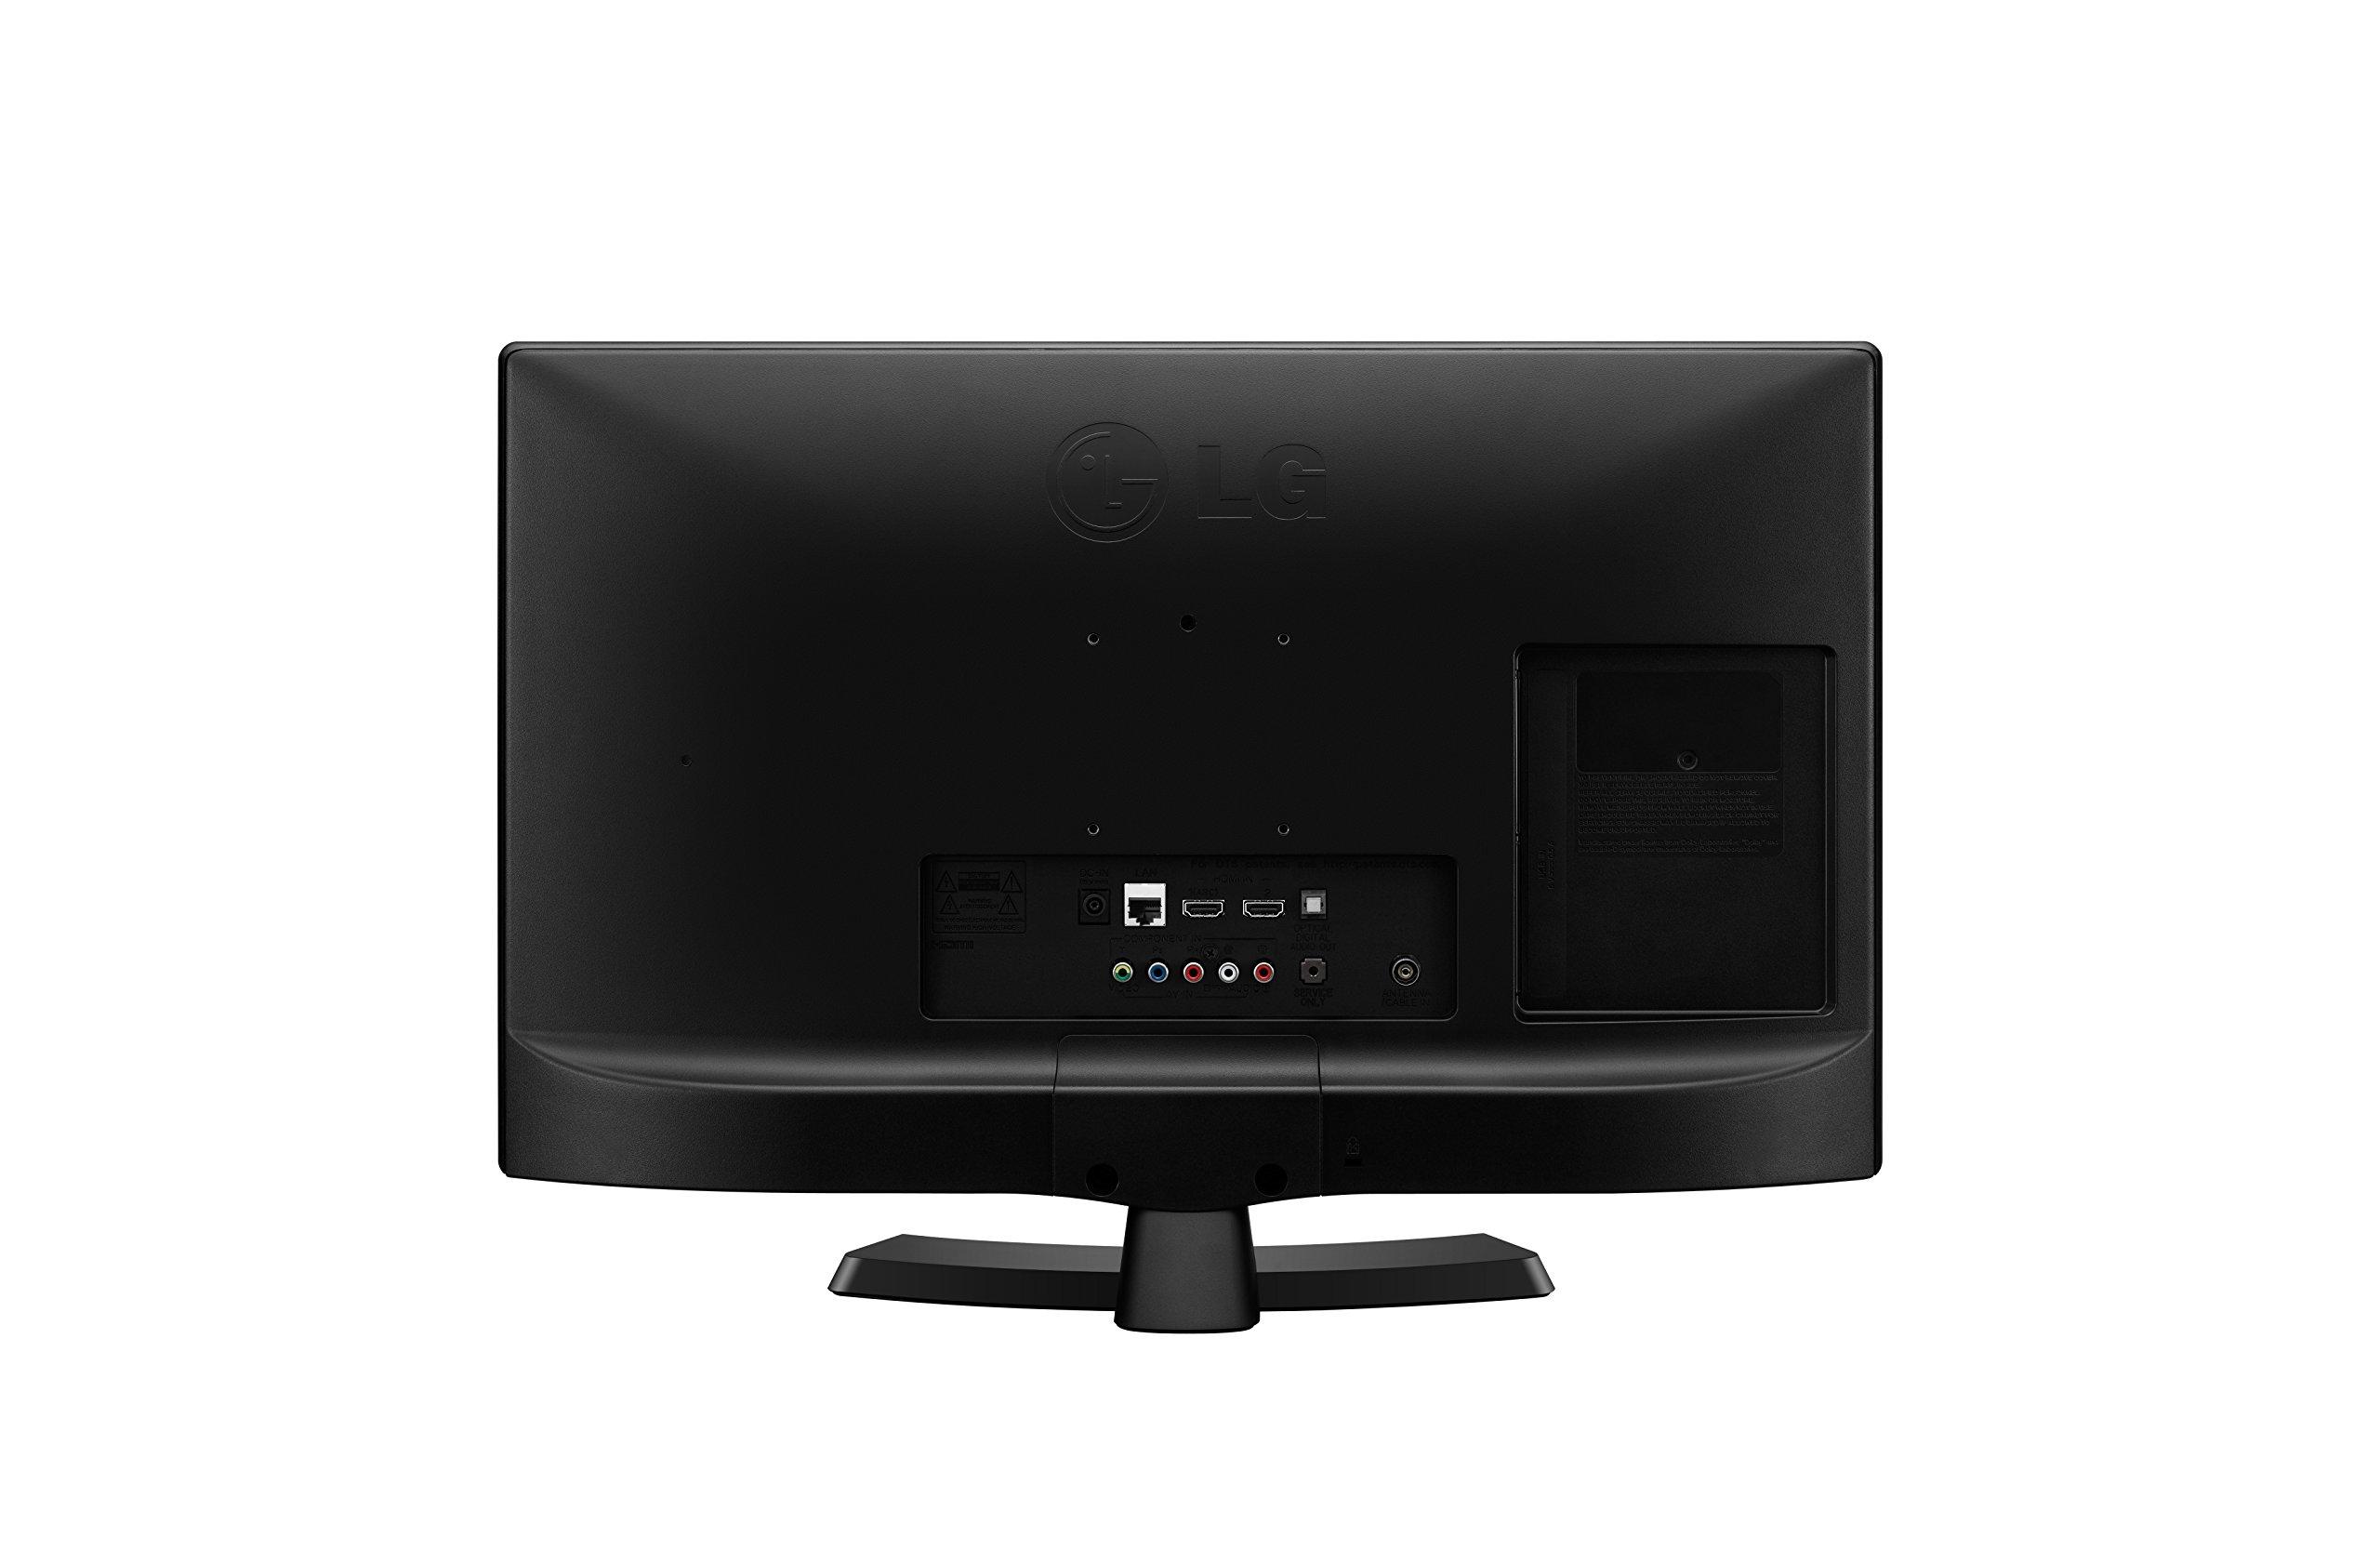 lg electronics 24lh4830 pu 24 inch smart led tv 2016 model amazon. Black Bedroom Furniture Sets. Home Design Ideas